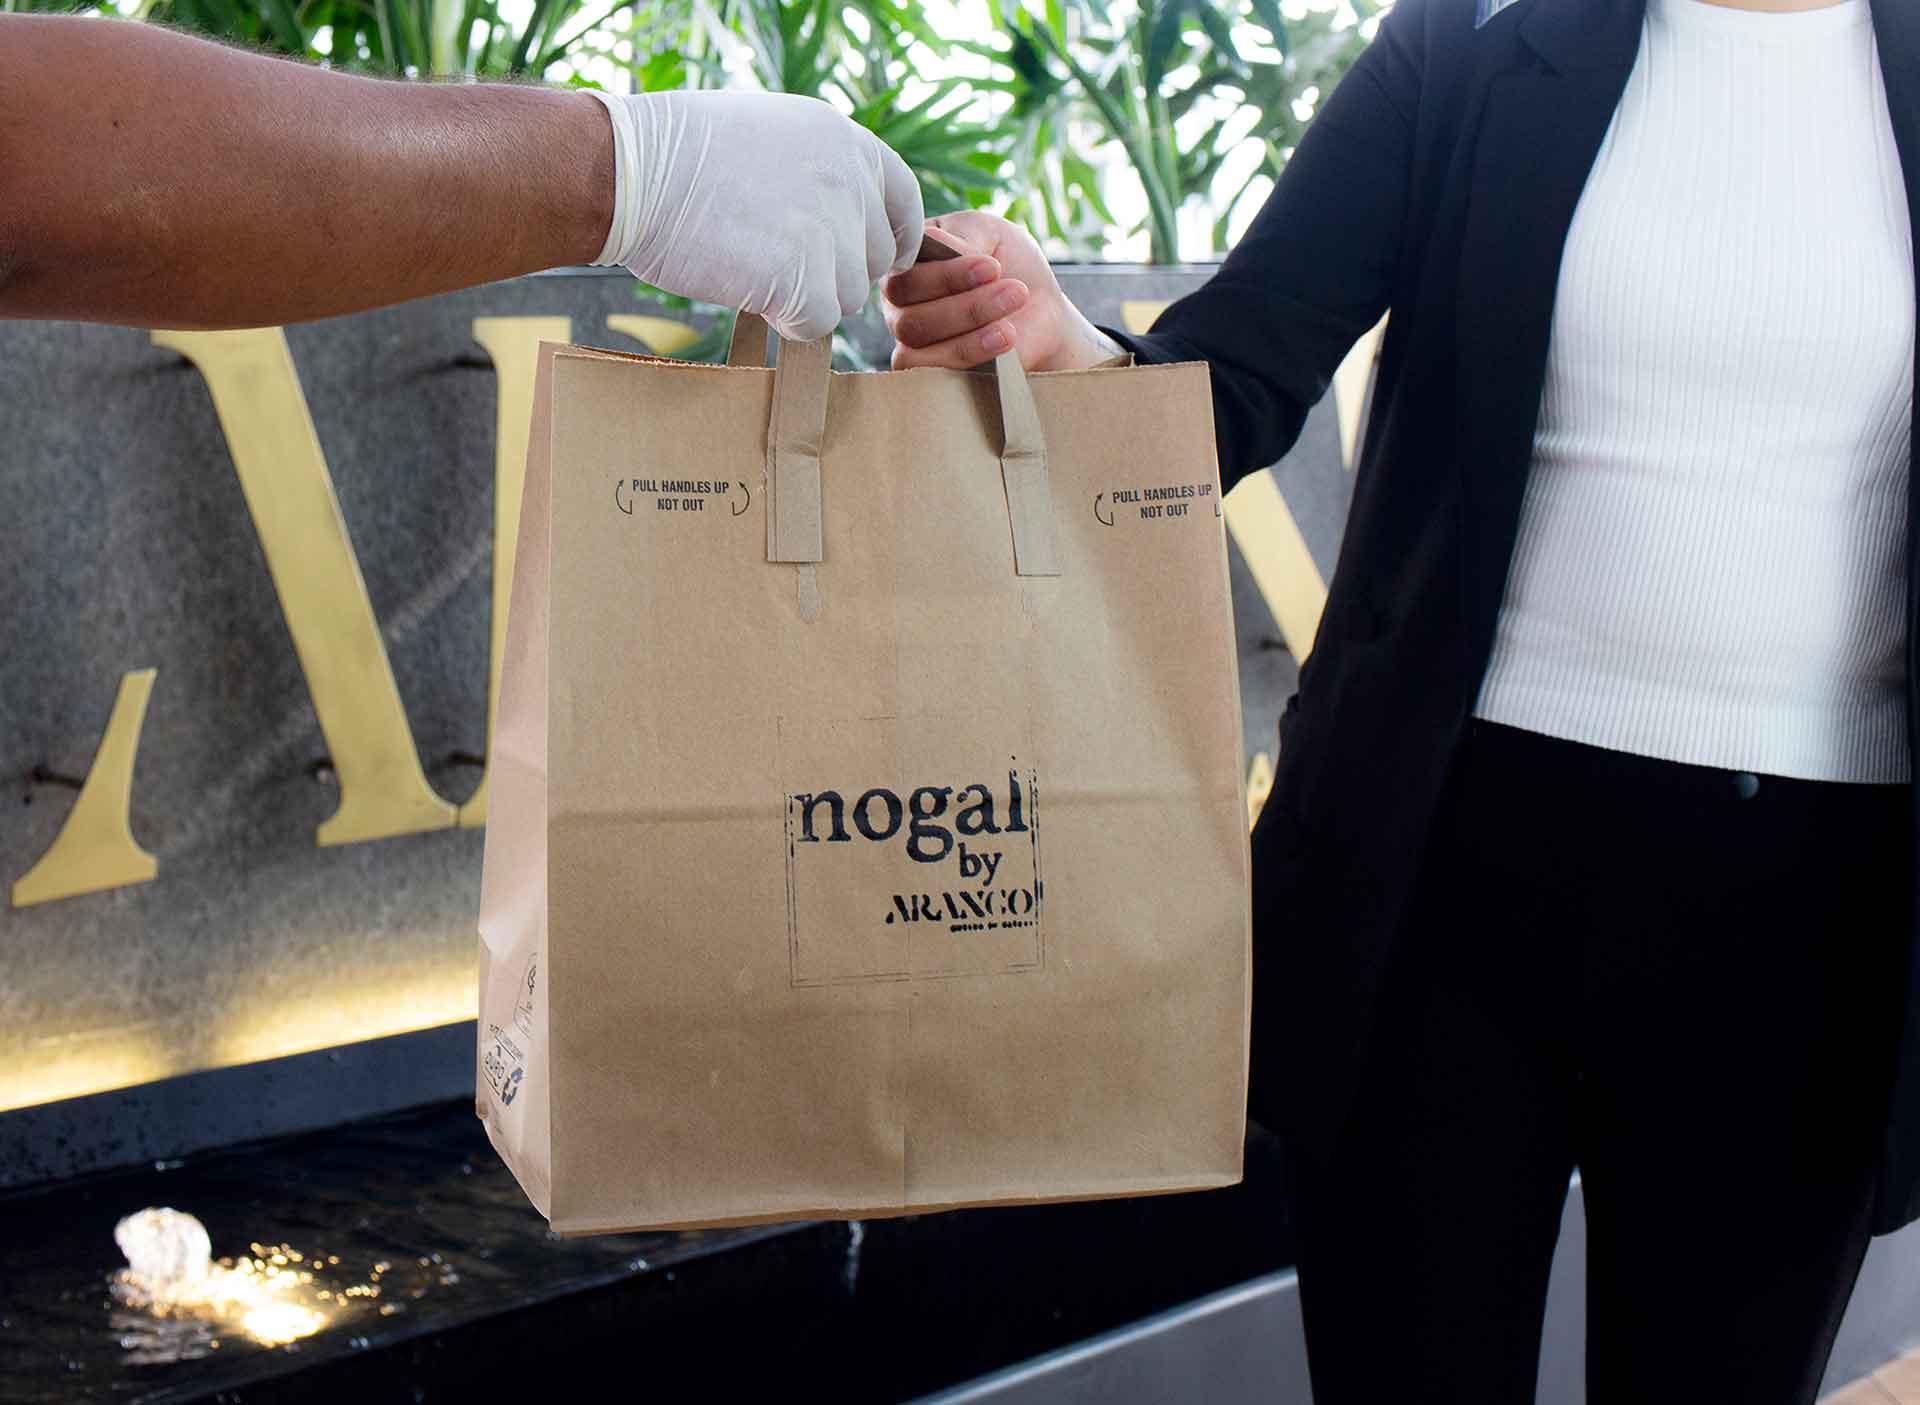 Nogal delivery